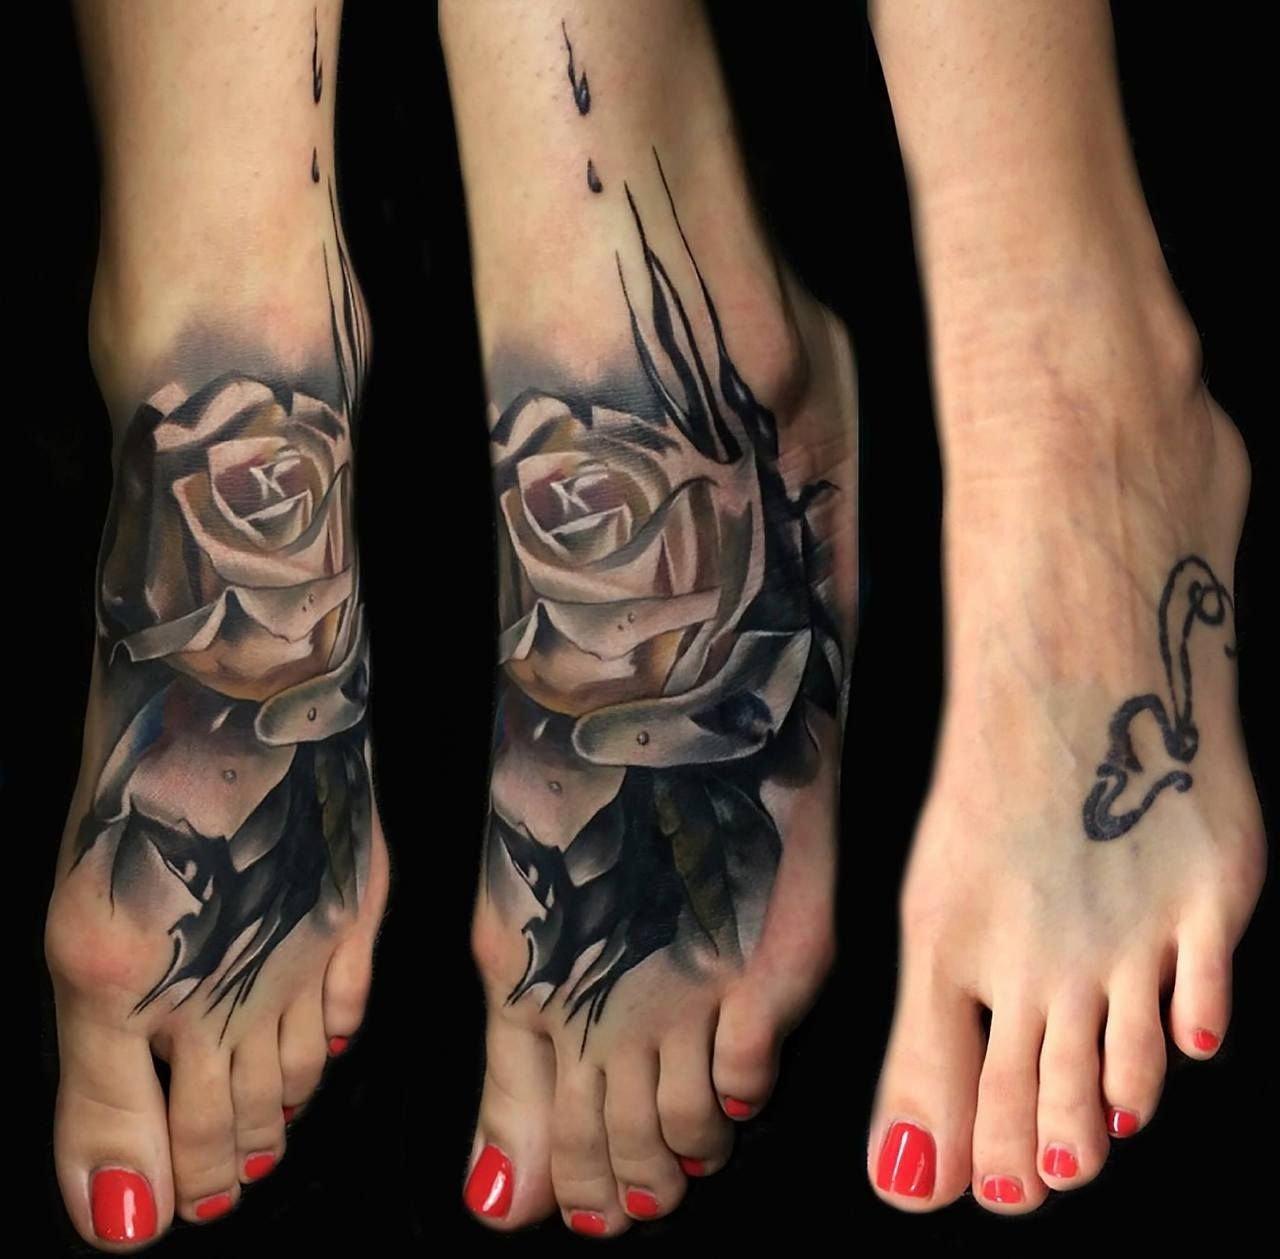 coverup tattoo | foot rose cover up tattoo design | best tattoo